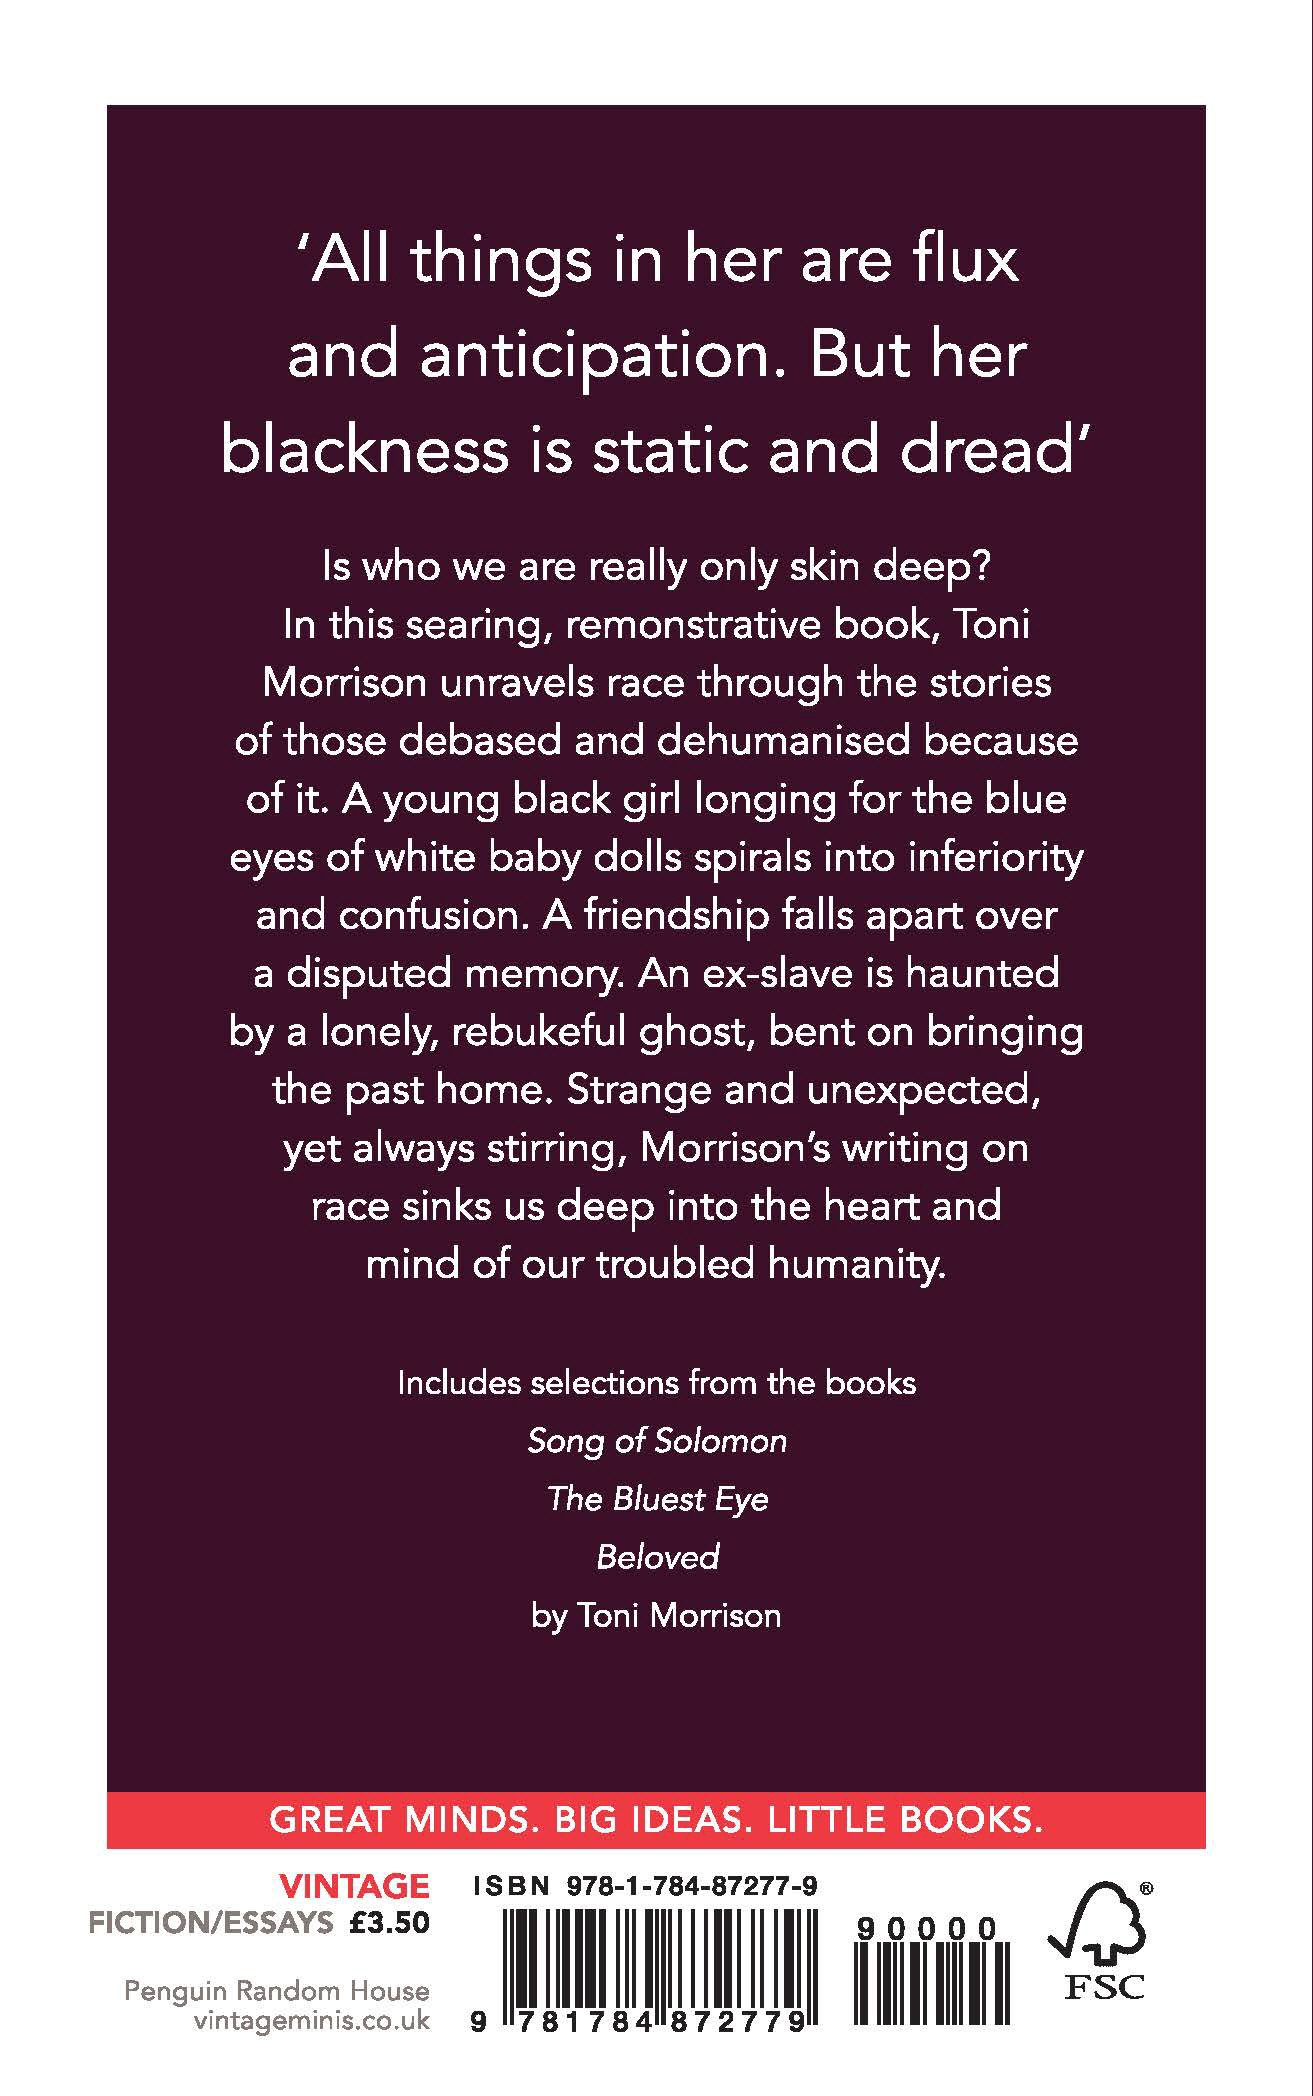 Race Vintage Minis Toni Morrison  Amazoncom Books  Buy Business Plans also Best Man Speech Writing Services  Apa Sample Essay Paper